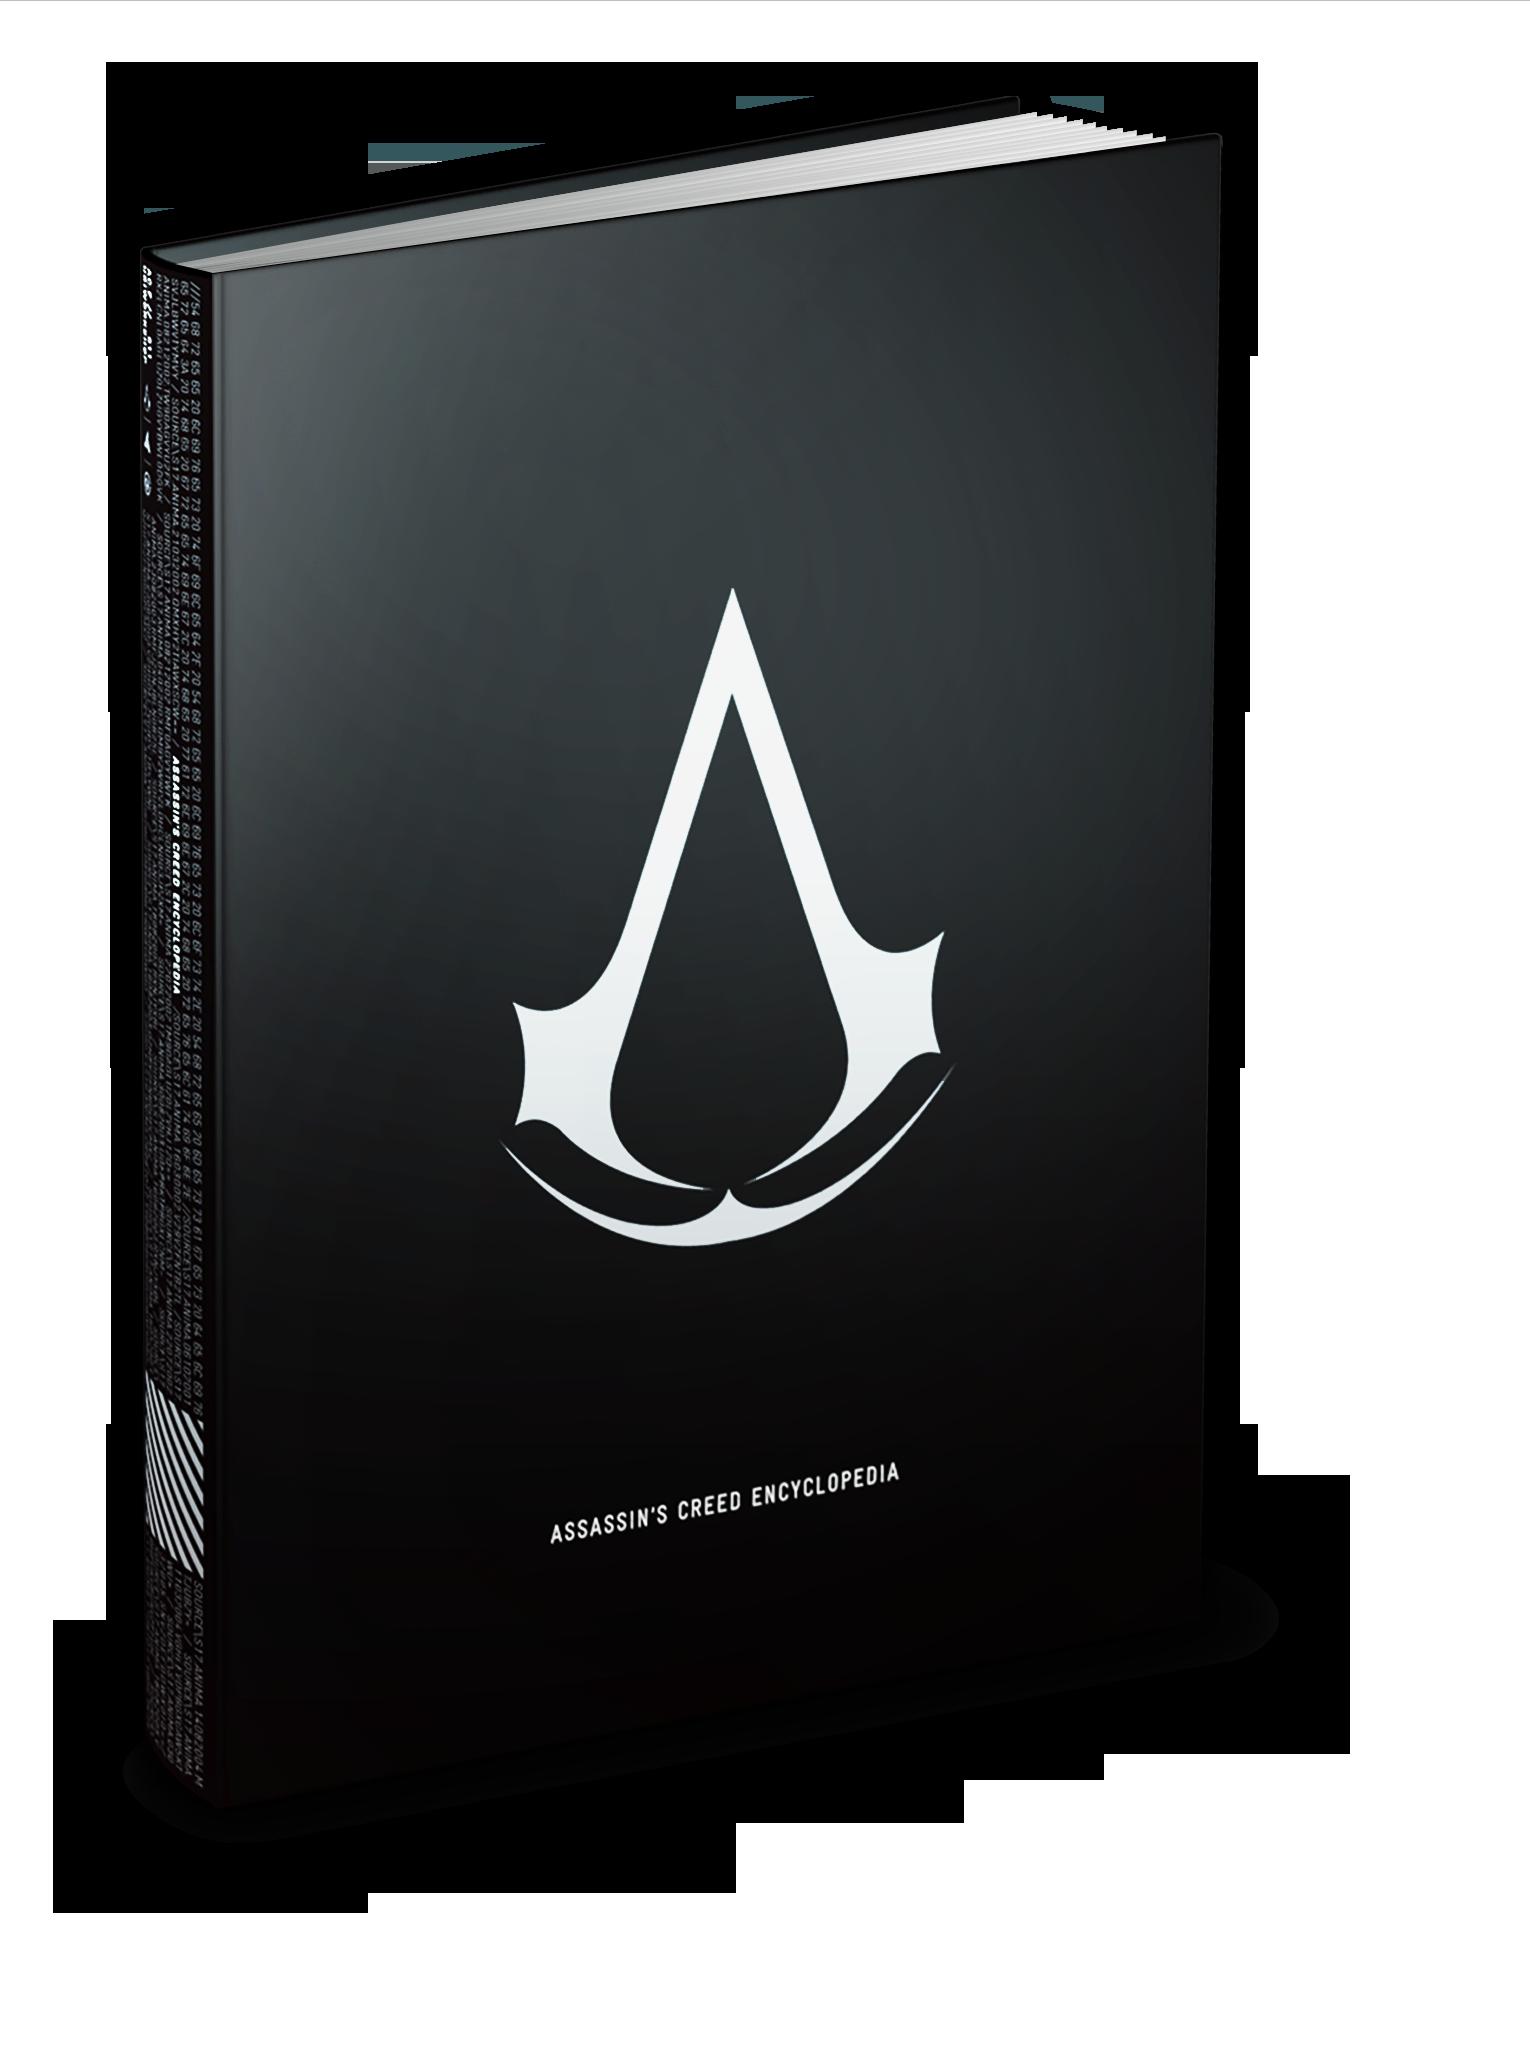 Encyclopedia Assassins creed, Assassin, Best games